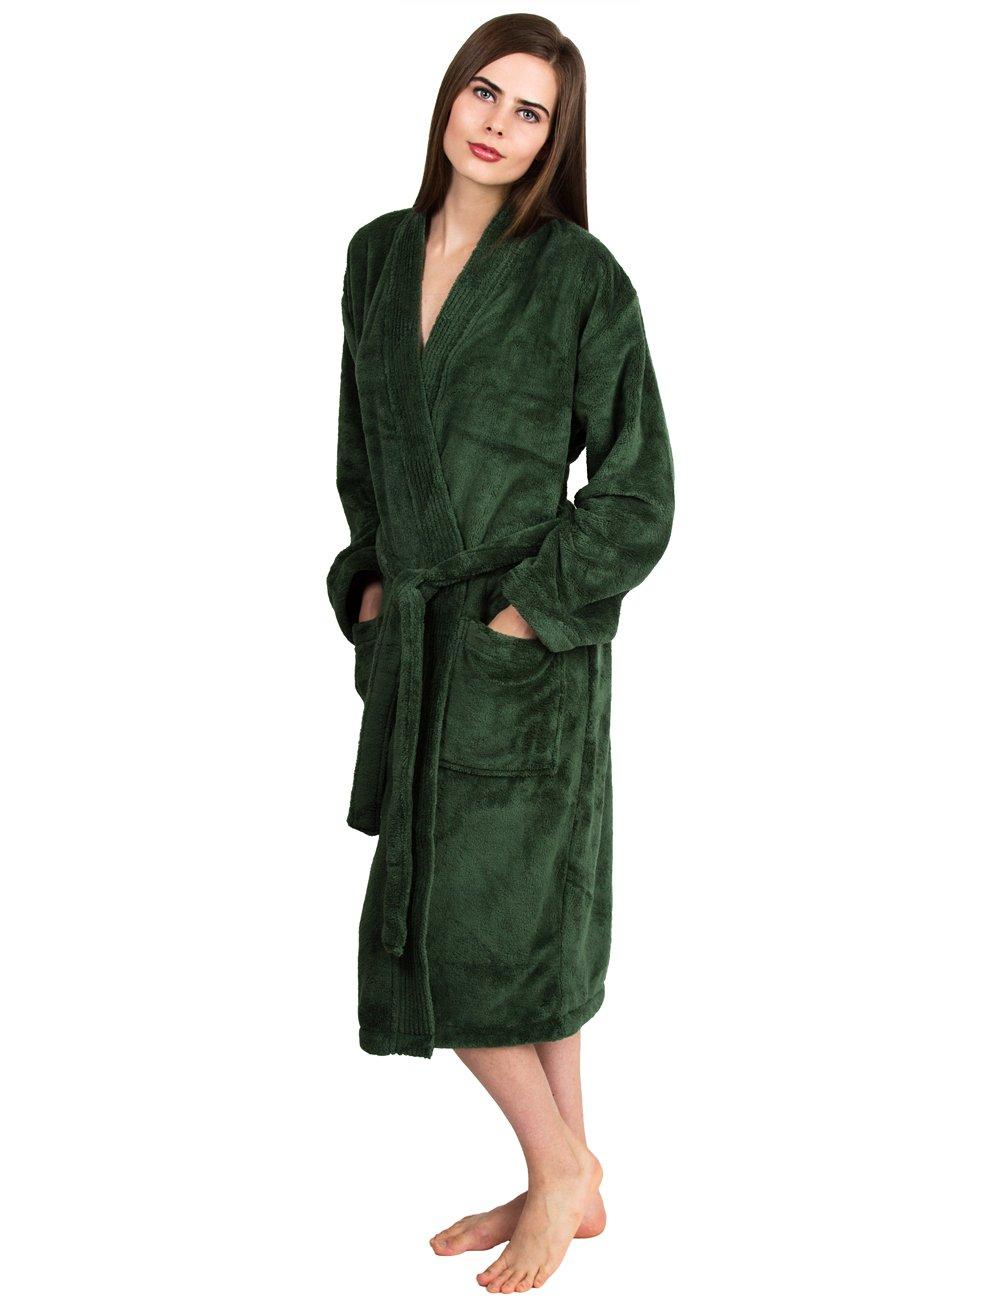 TowelSelections Women's Plush Robe Soft Fleece Kimono Bathrobe X-Small/Small Hunter Green